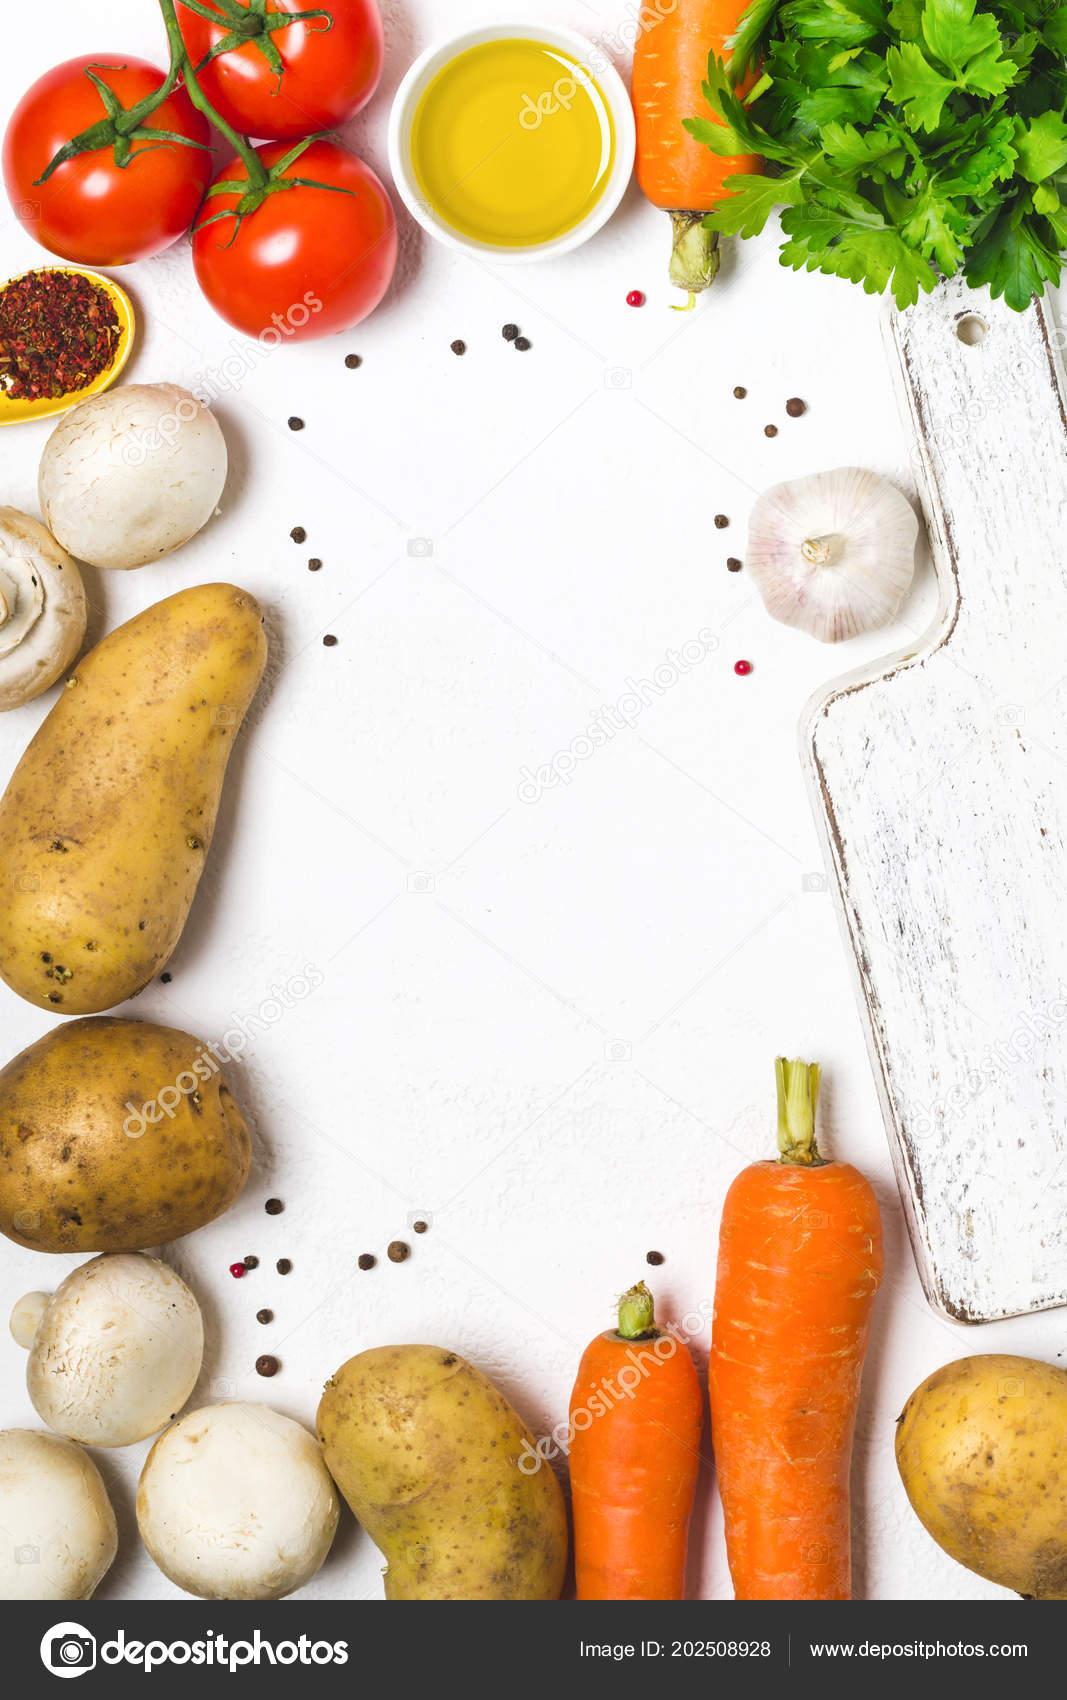 Wallpaper Food Cooking Grill Vegetables Peppers: 음식 요리 배경입니다. 신선한 야채, 향신료, 흰색 바탕에 버섯